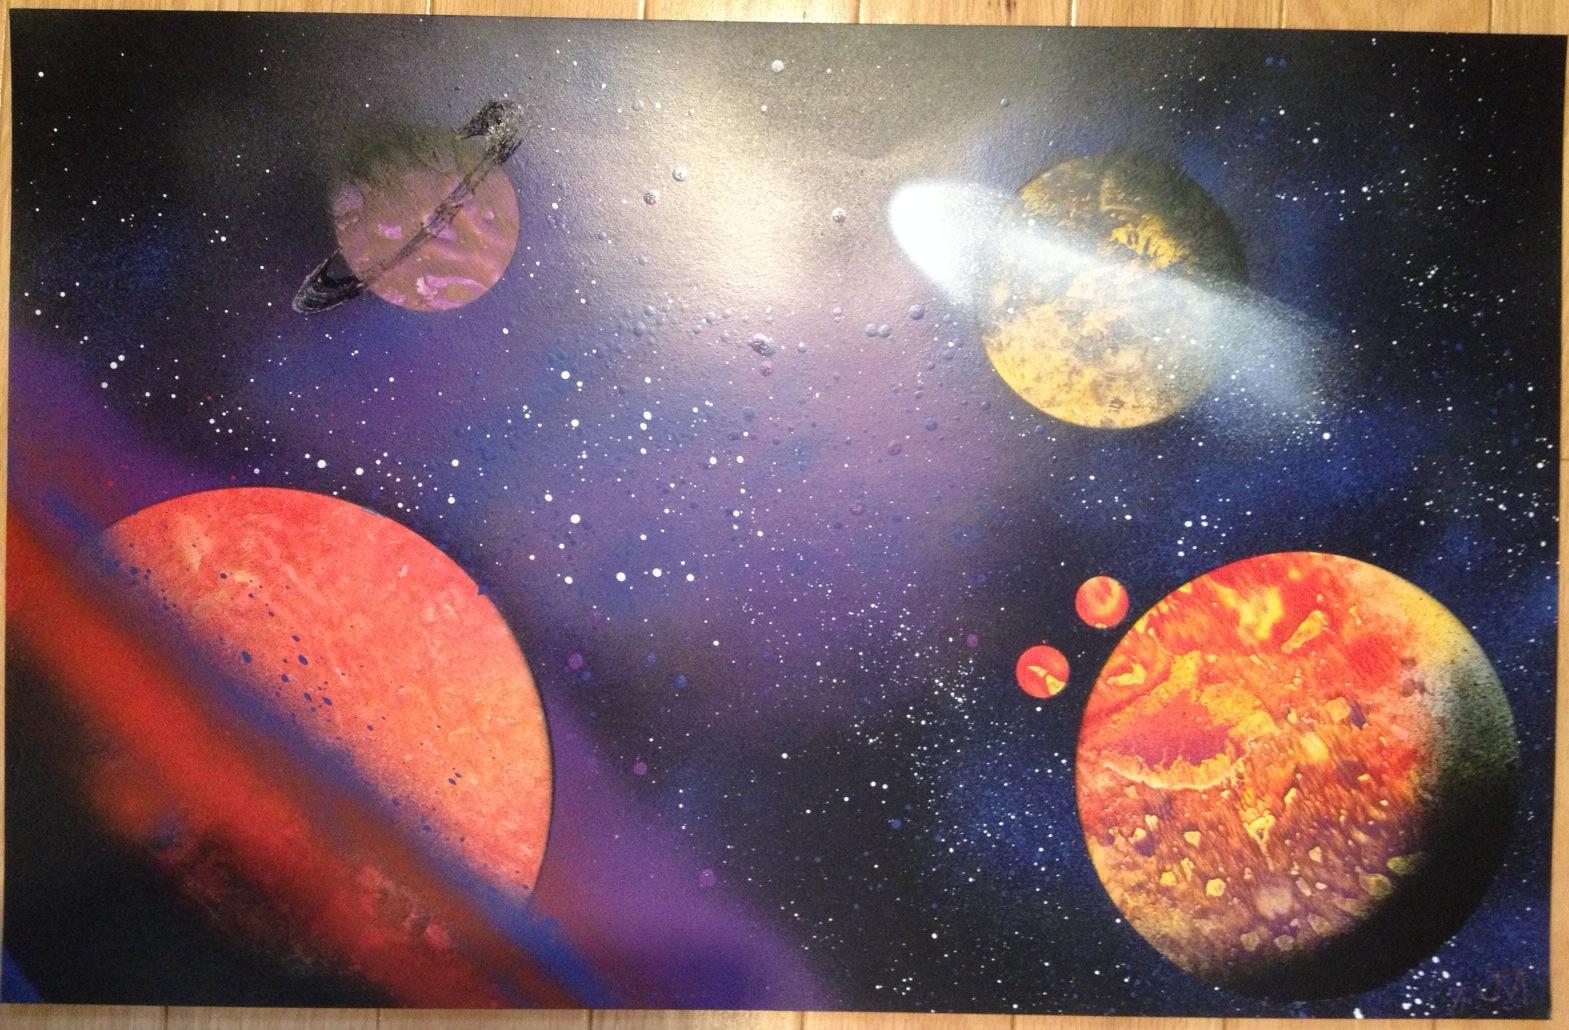 spray paintings for sale online fantasy spray paint art. Black Bedroom Furniture Sets. Home Design Ideas